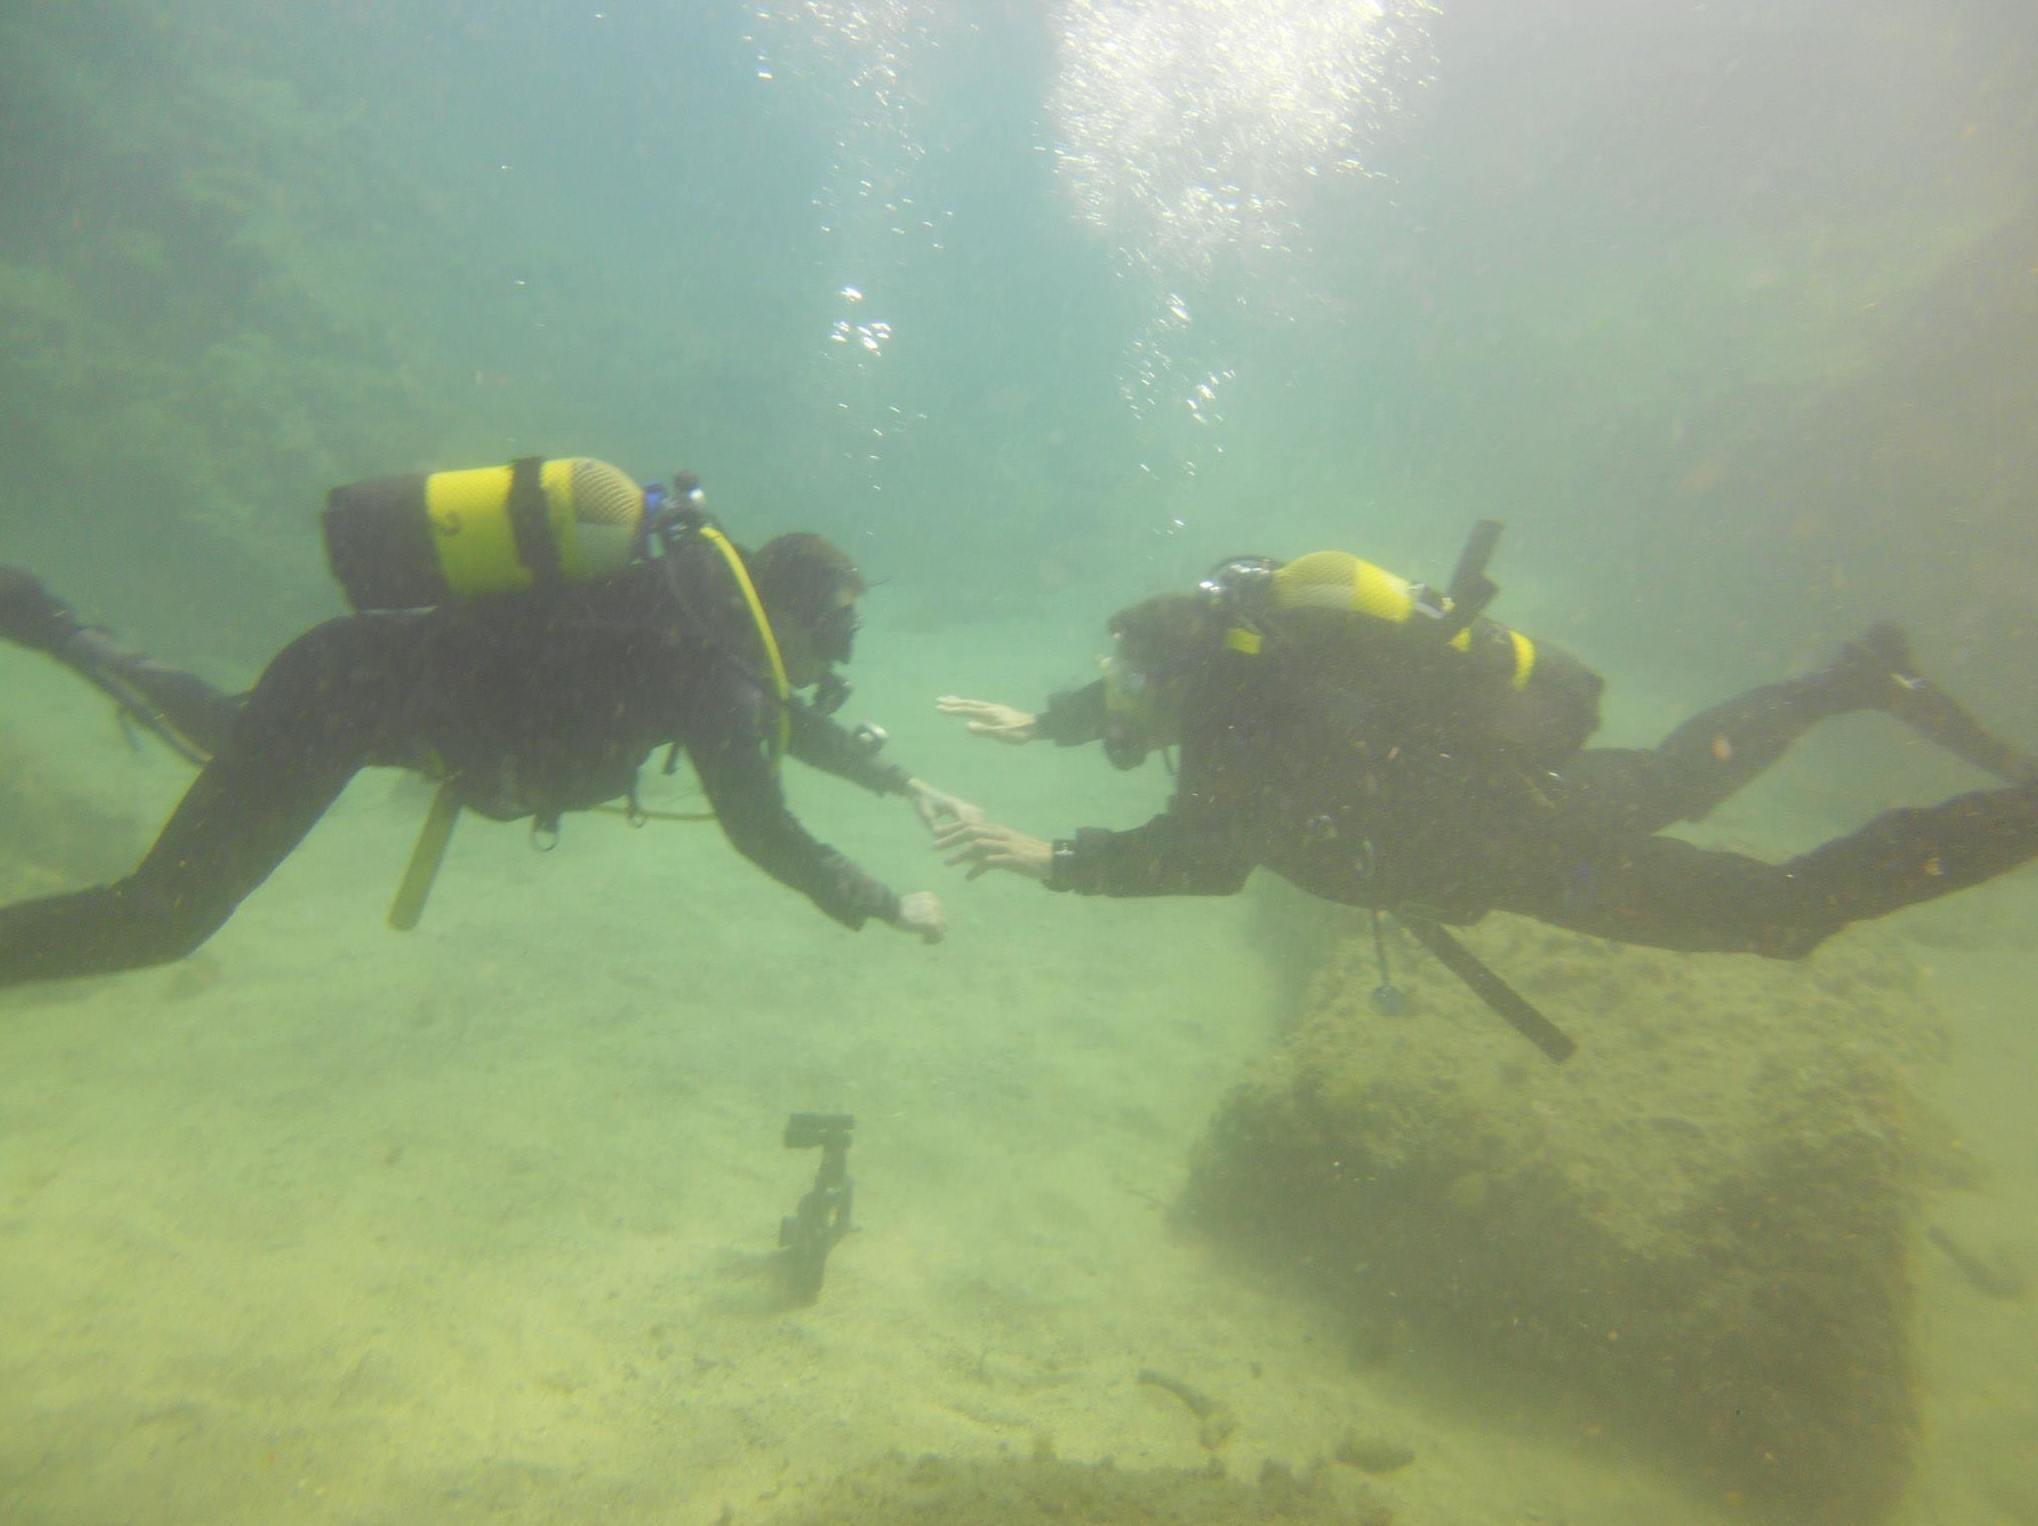 Talleres de biología marina